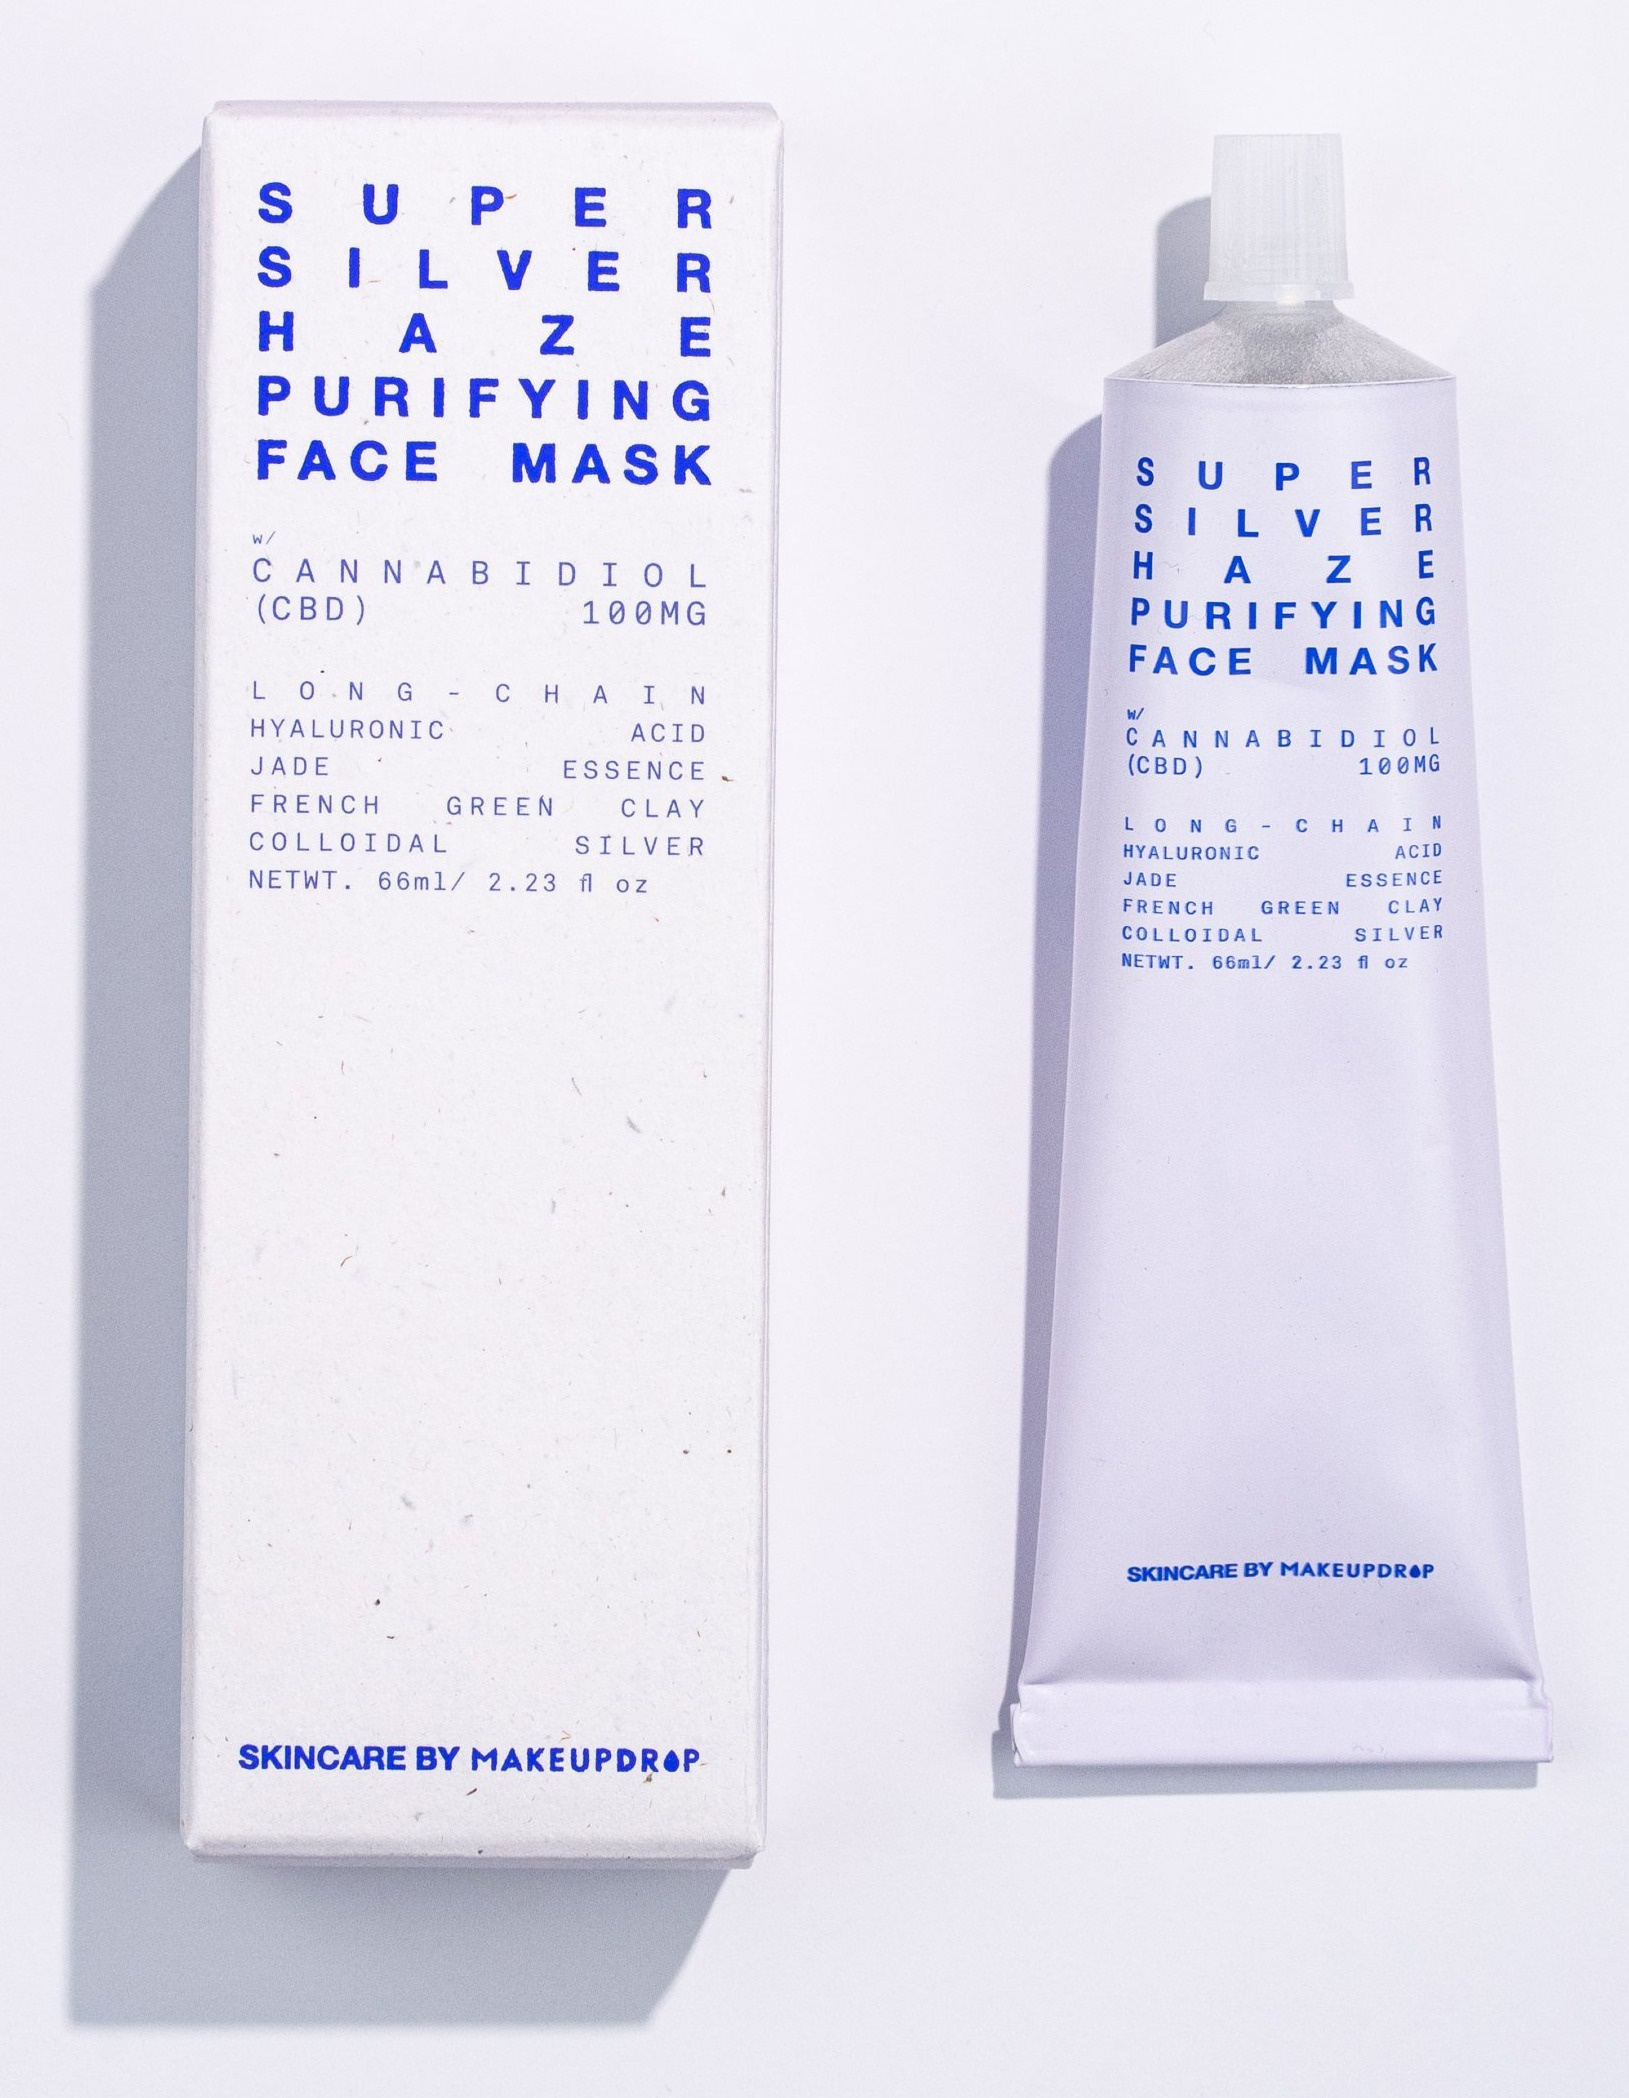 Super Silver Haze Purifying Face Mask